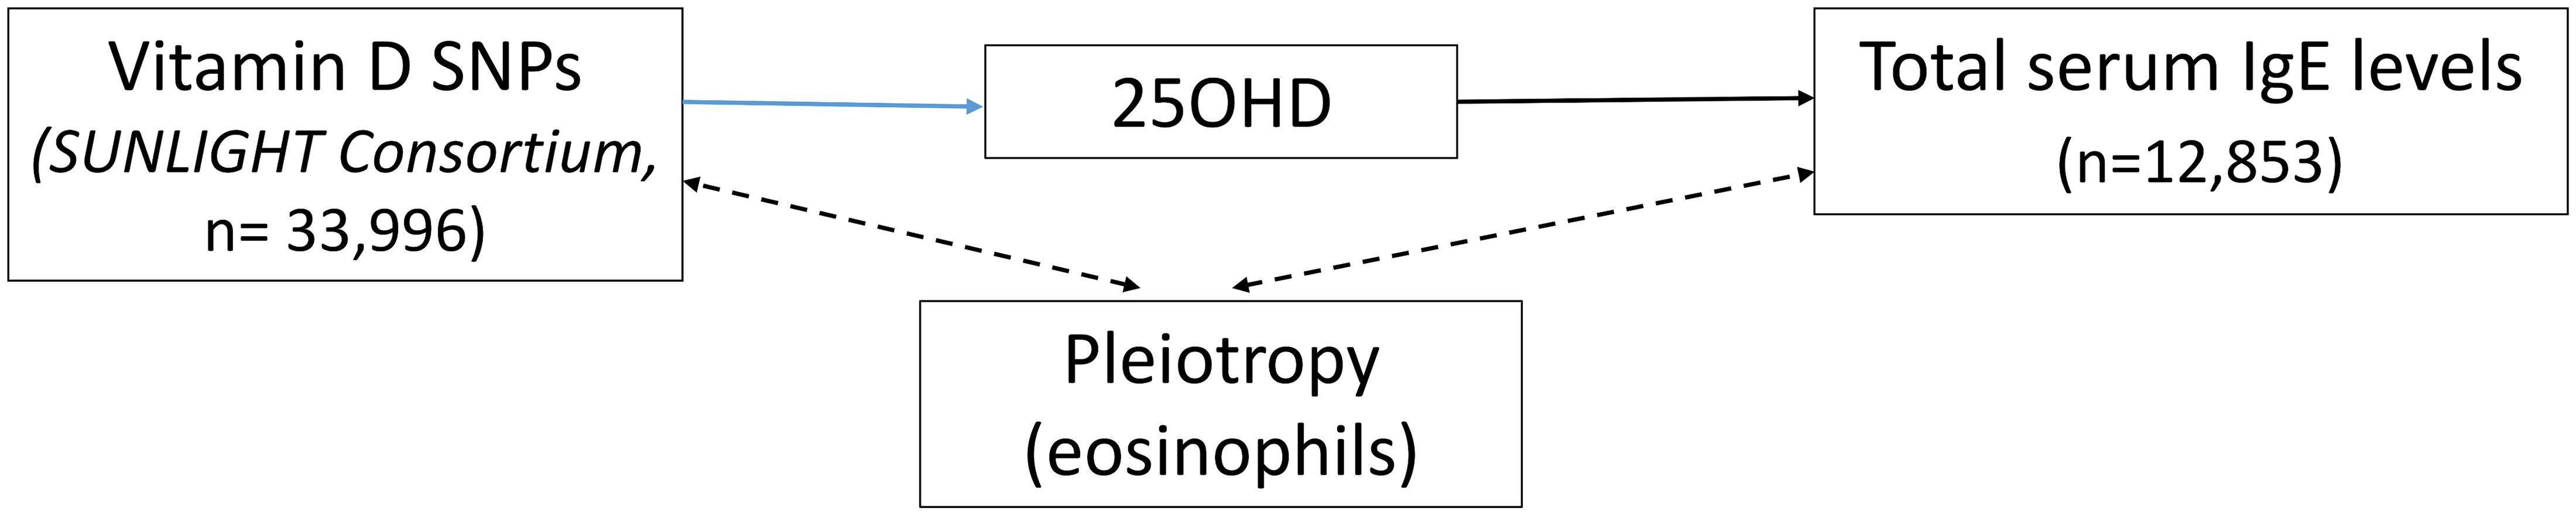 Direct Acyclic Graph (DAG) of the Mendelian randomization analysis for Immunoglobulin E (IgE) levels.